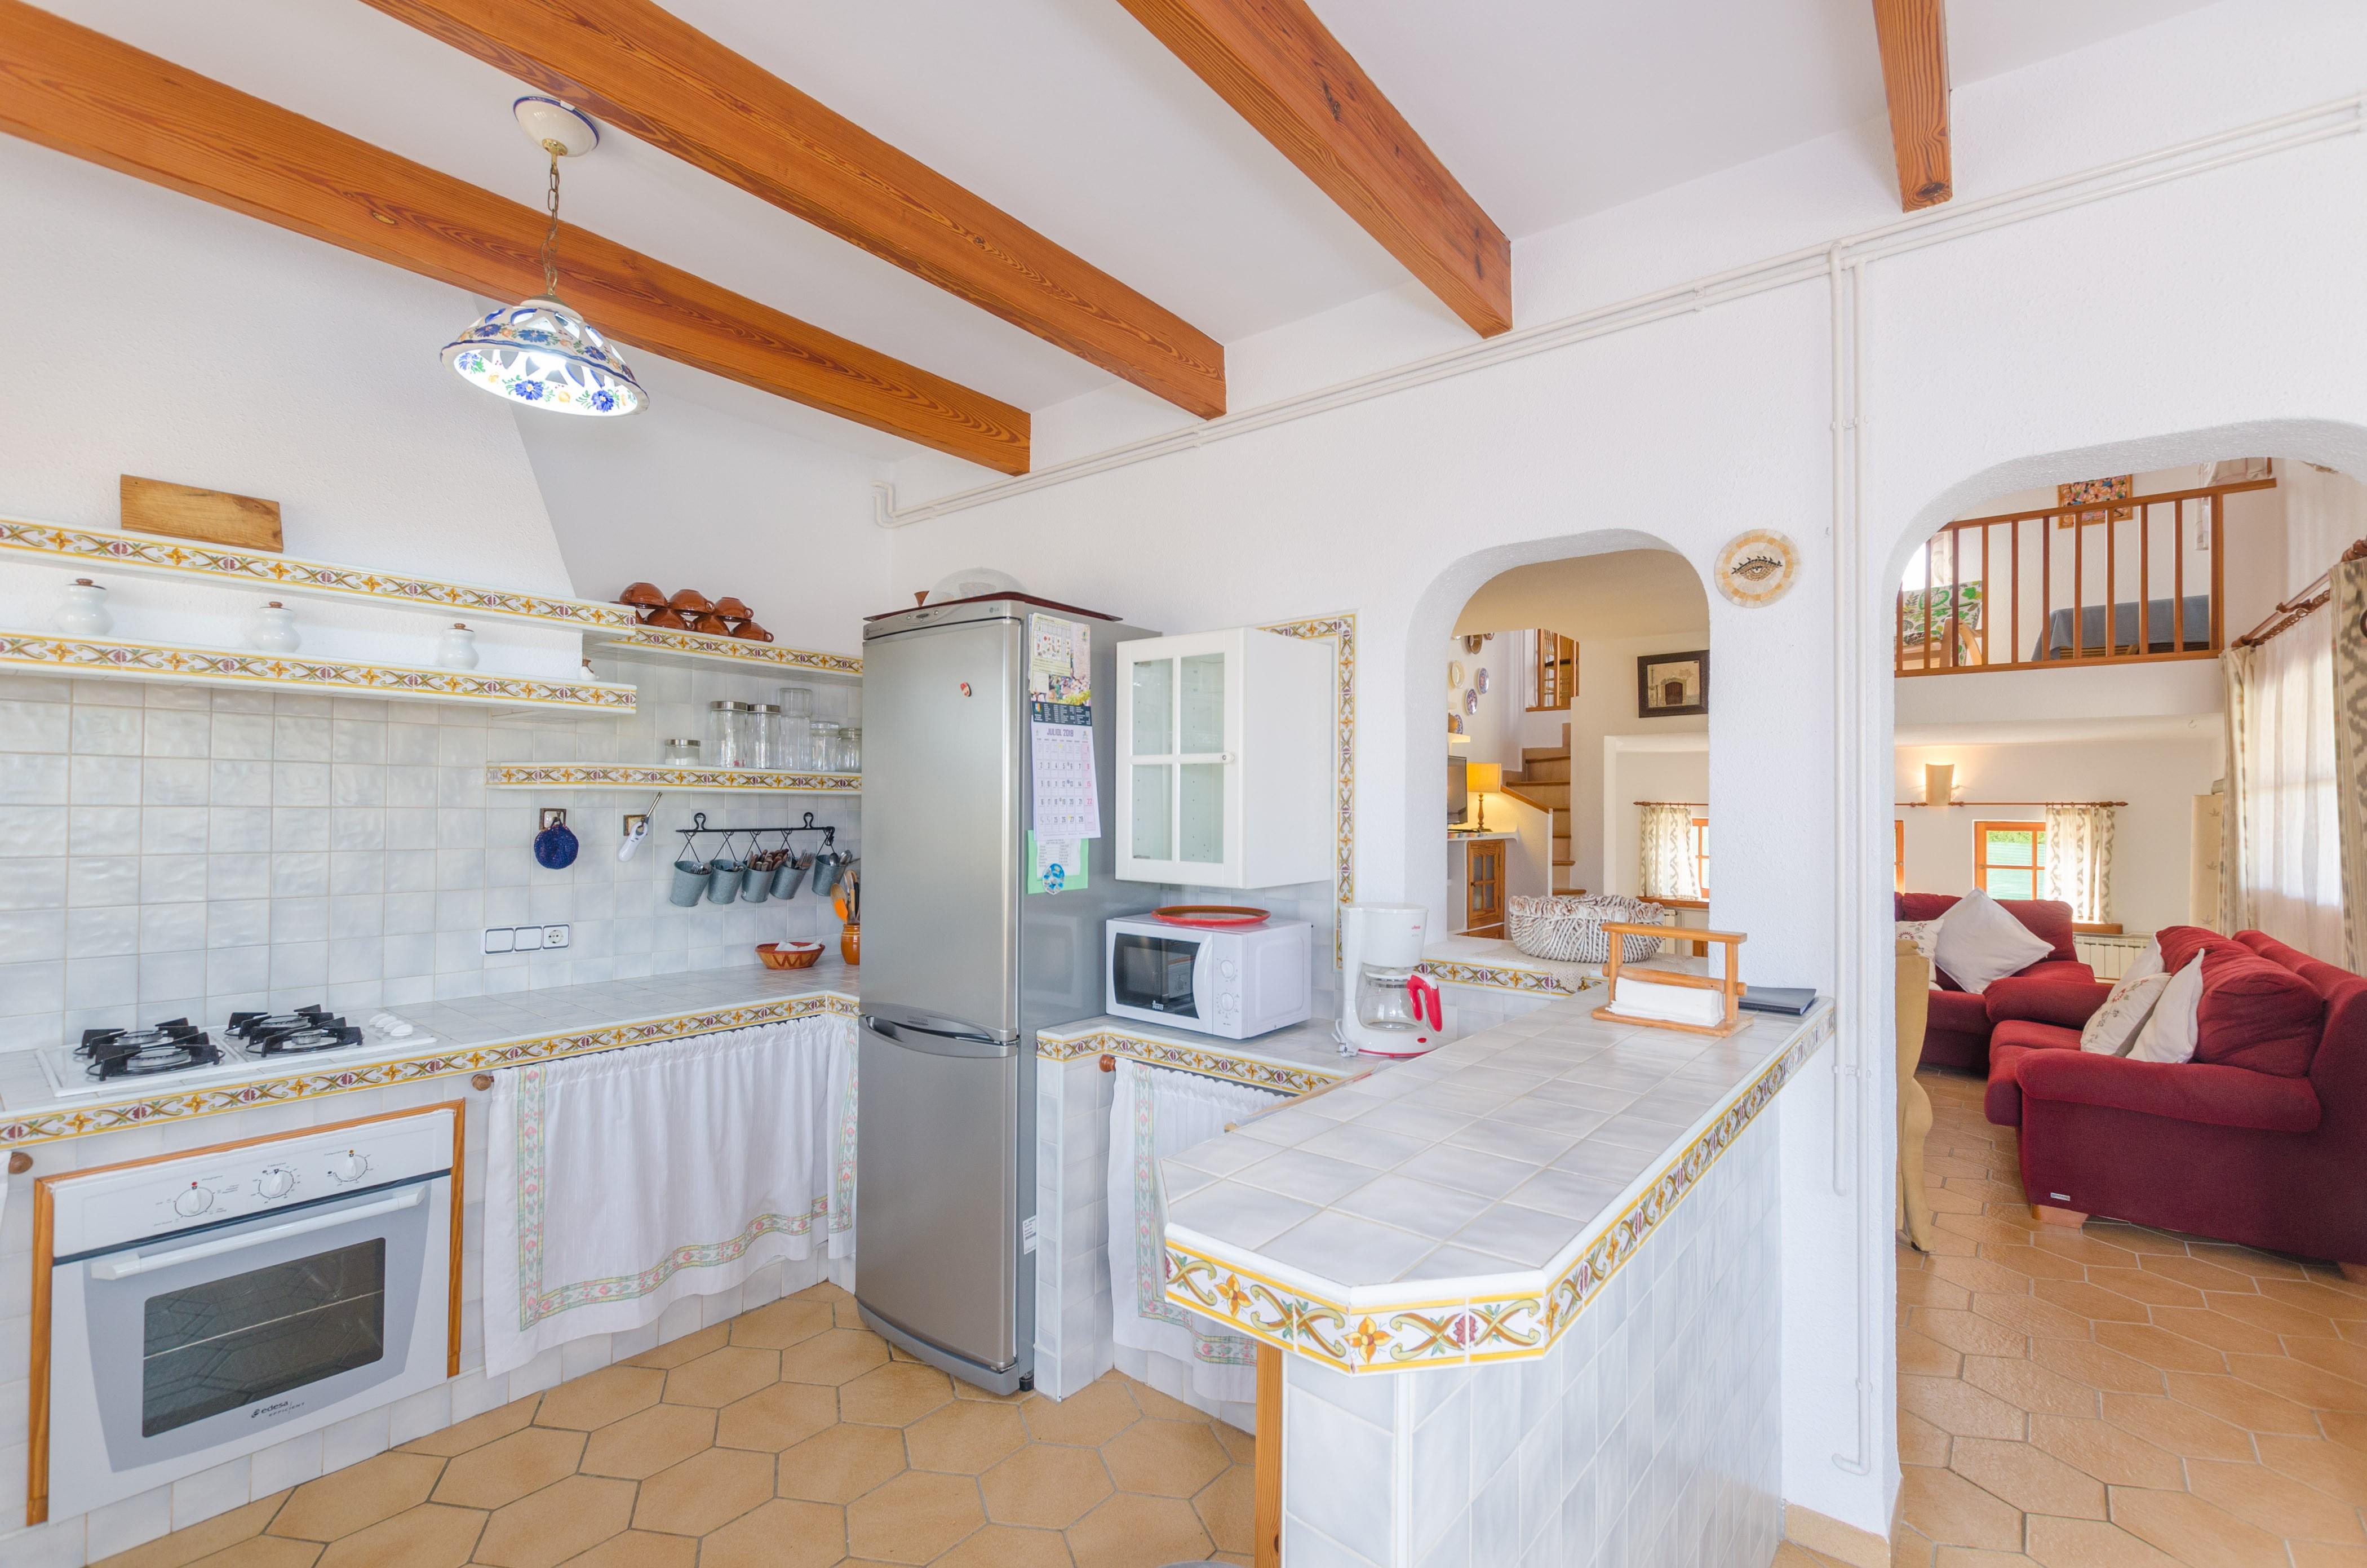 Maison de vacances SA SINIA (2374876), Lloret de Vistalegre, Majorque, Iles Baléares, Espagne, image 18